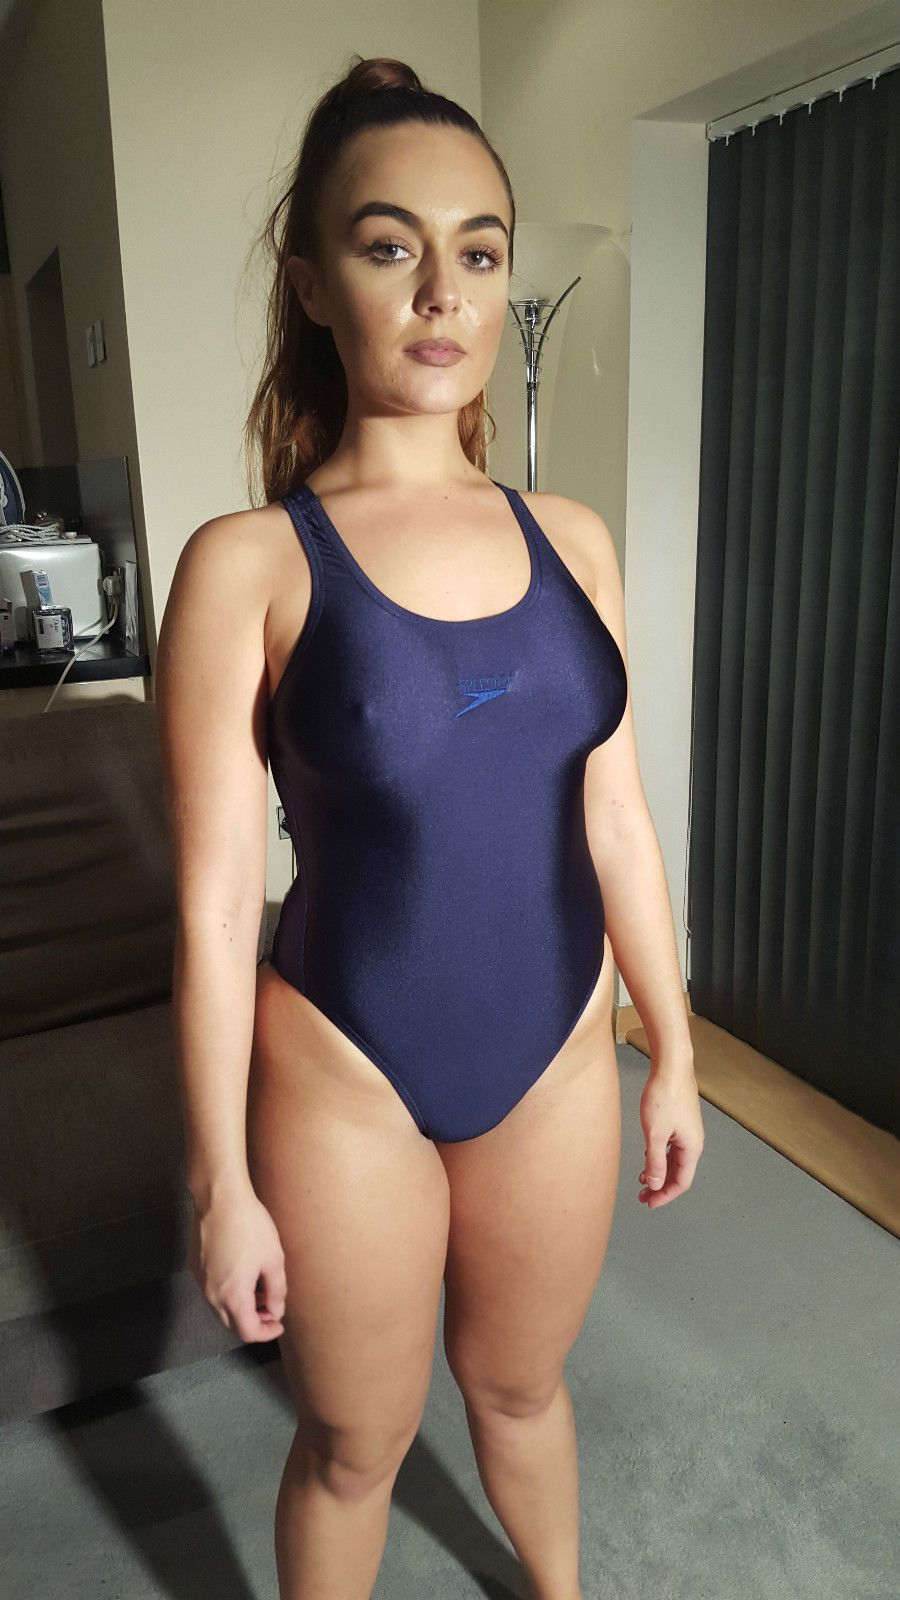 Blue Speedo Racing Swimsuit Swimming Costume Shiny Lycra Spandex UK 34